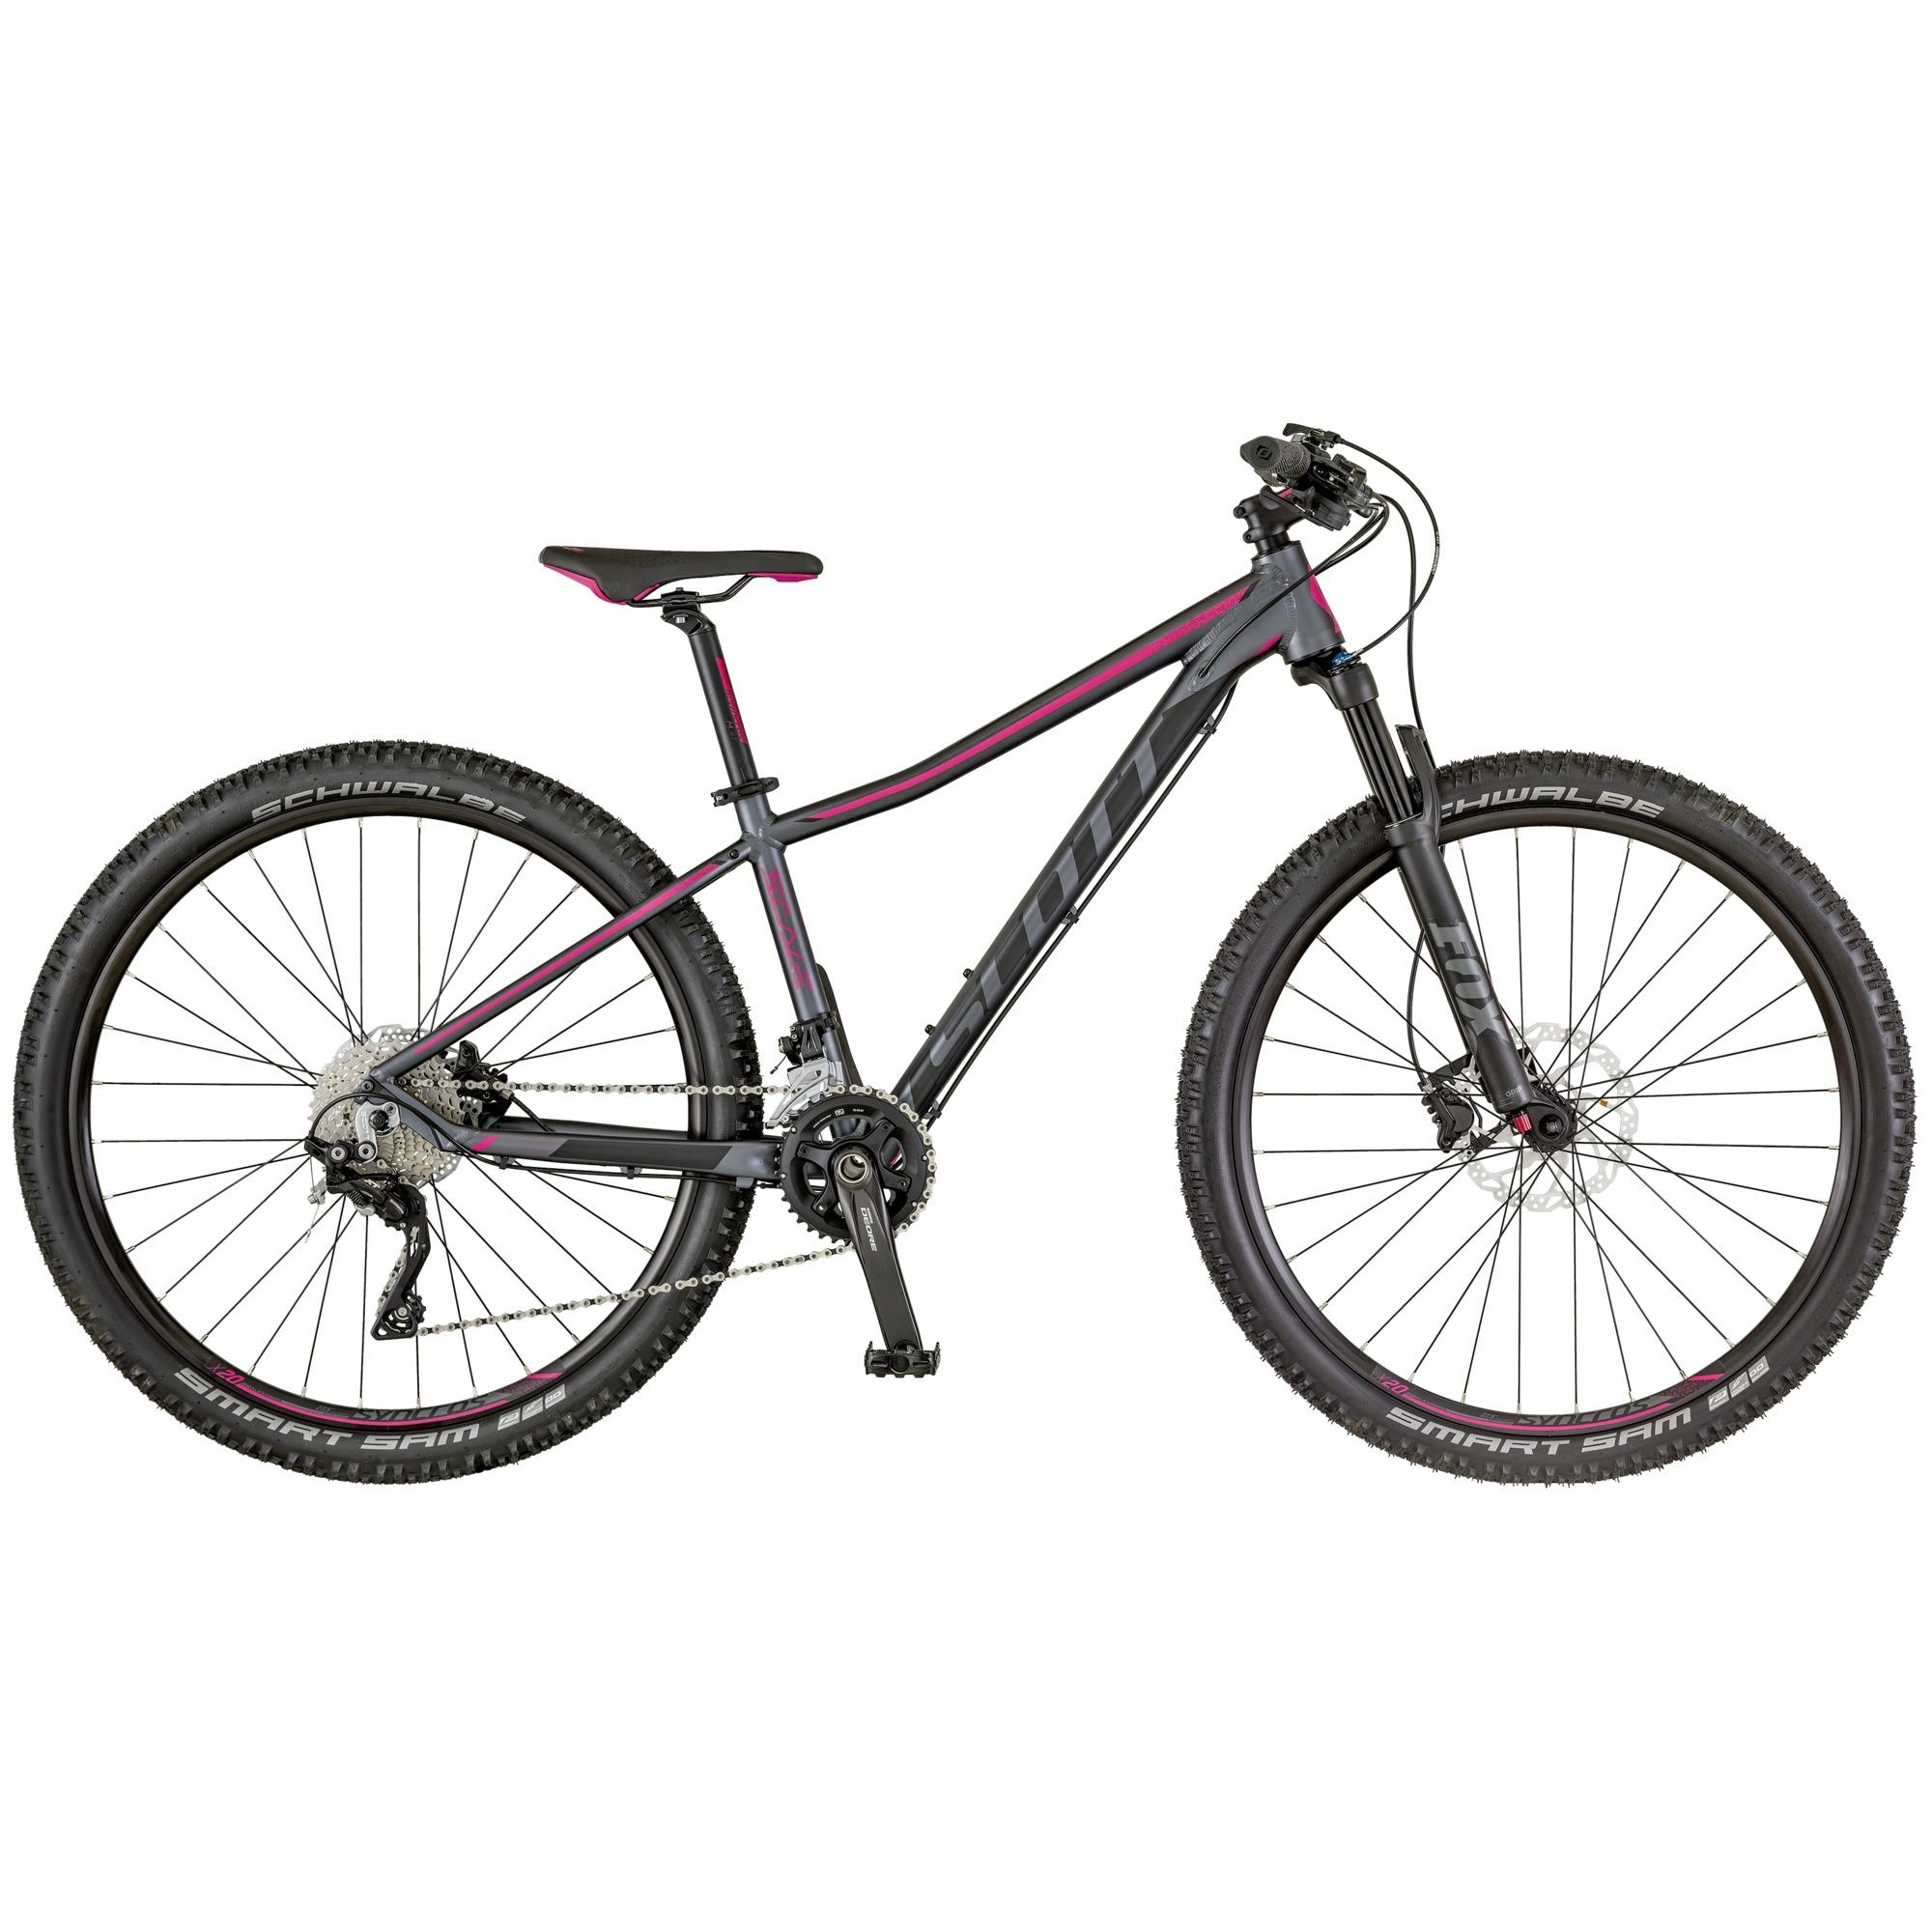 SCOTT Contessa Scale 10 Bike L9 - Zweirad Homann